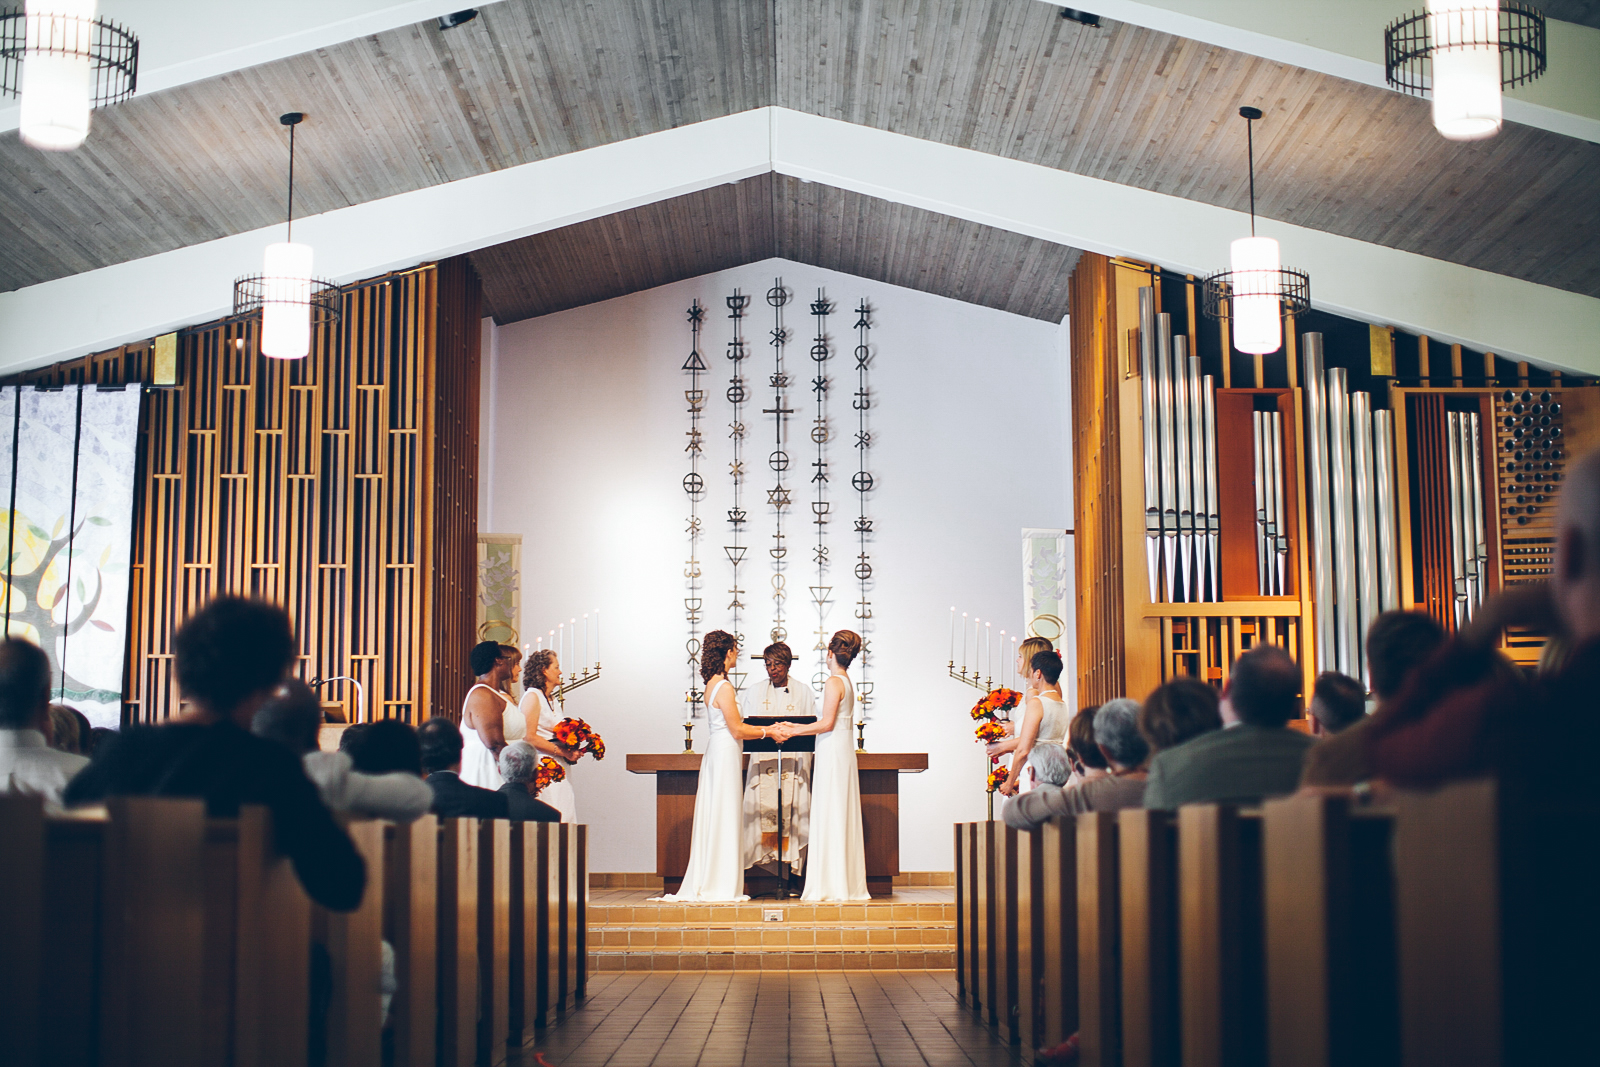 Riverside_ca_wedding_photography_marguerite_carolyn_ebony_siovhan_bokeh_photography_36.jpg